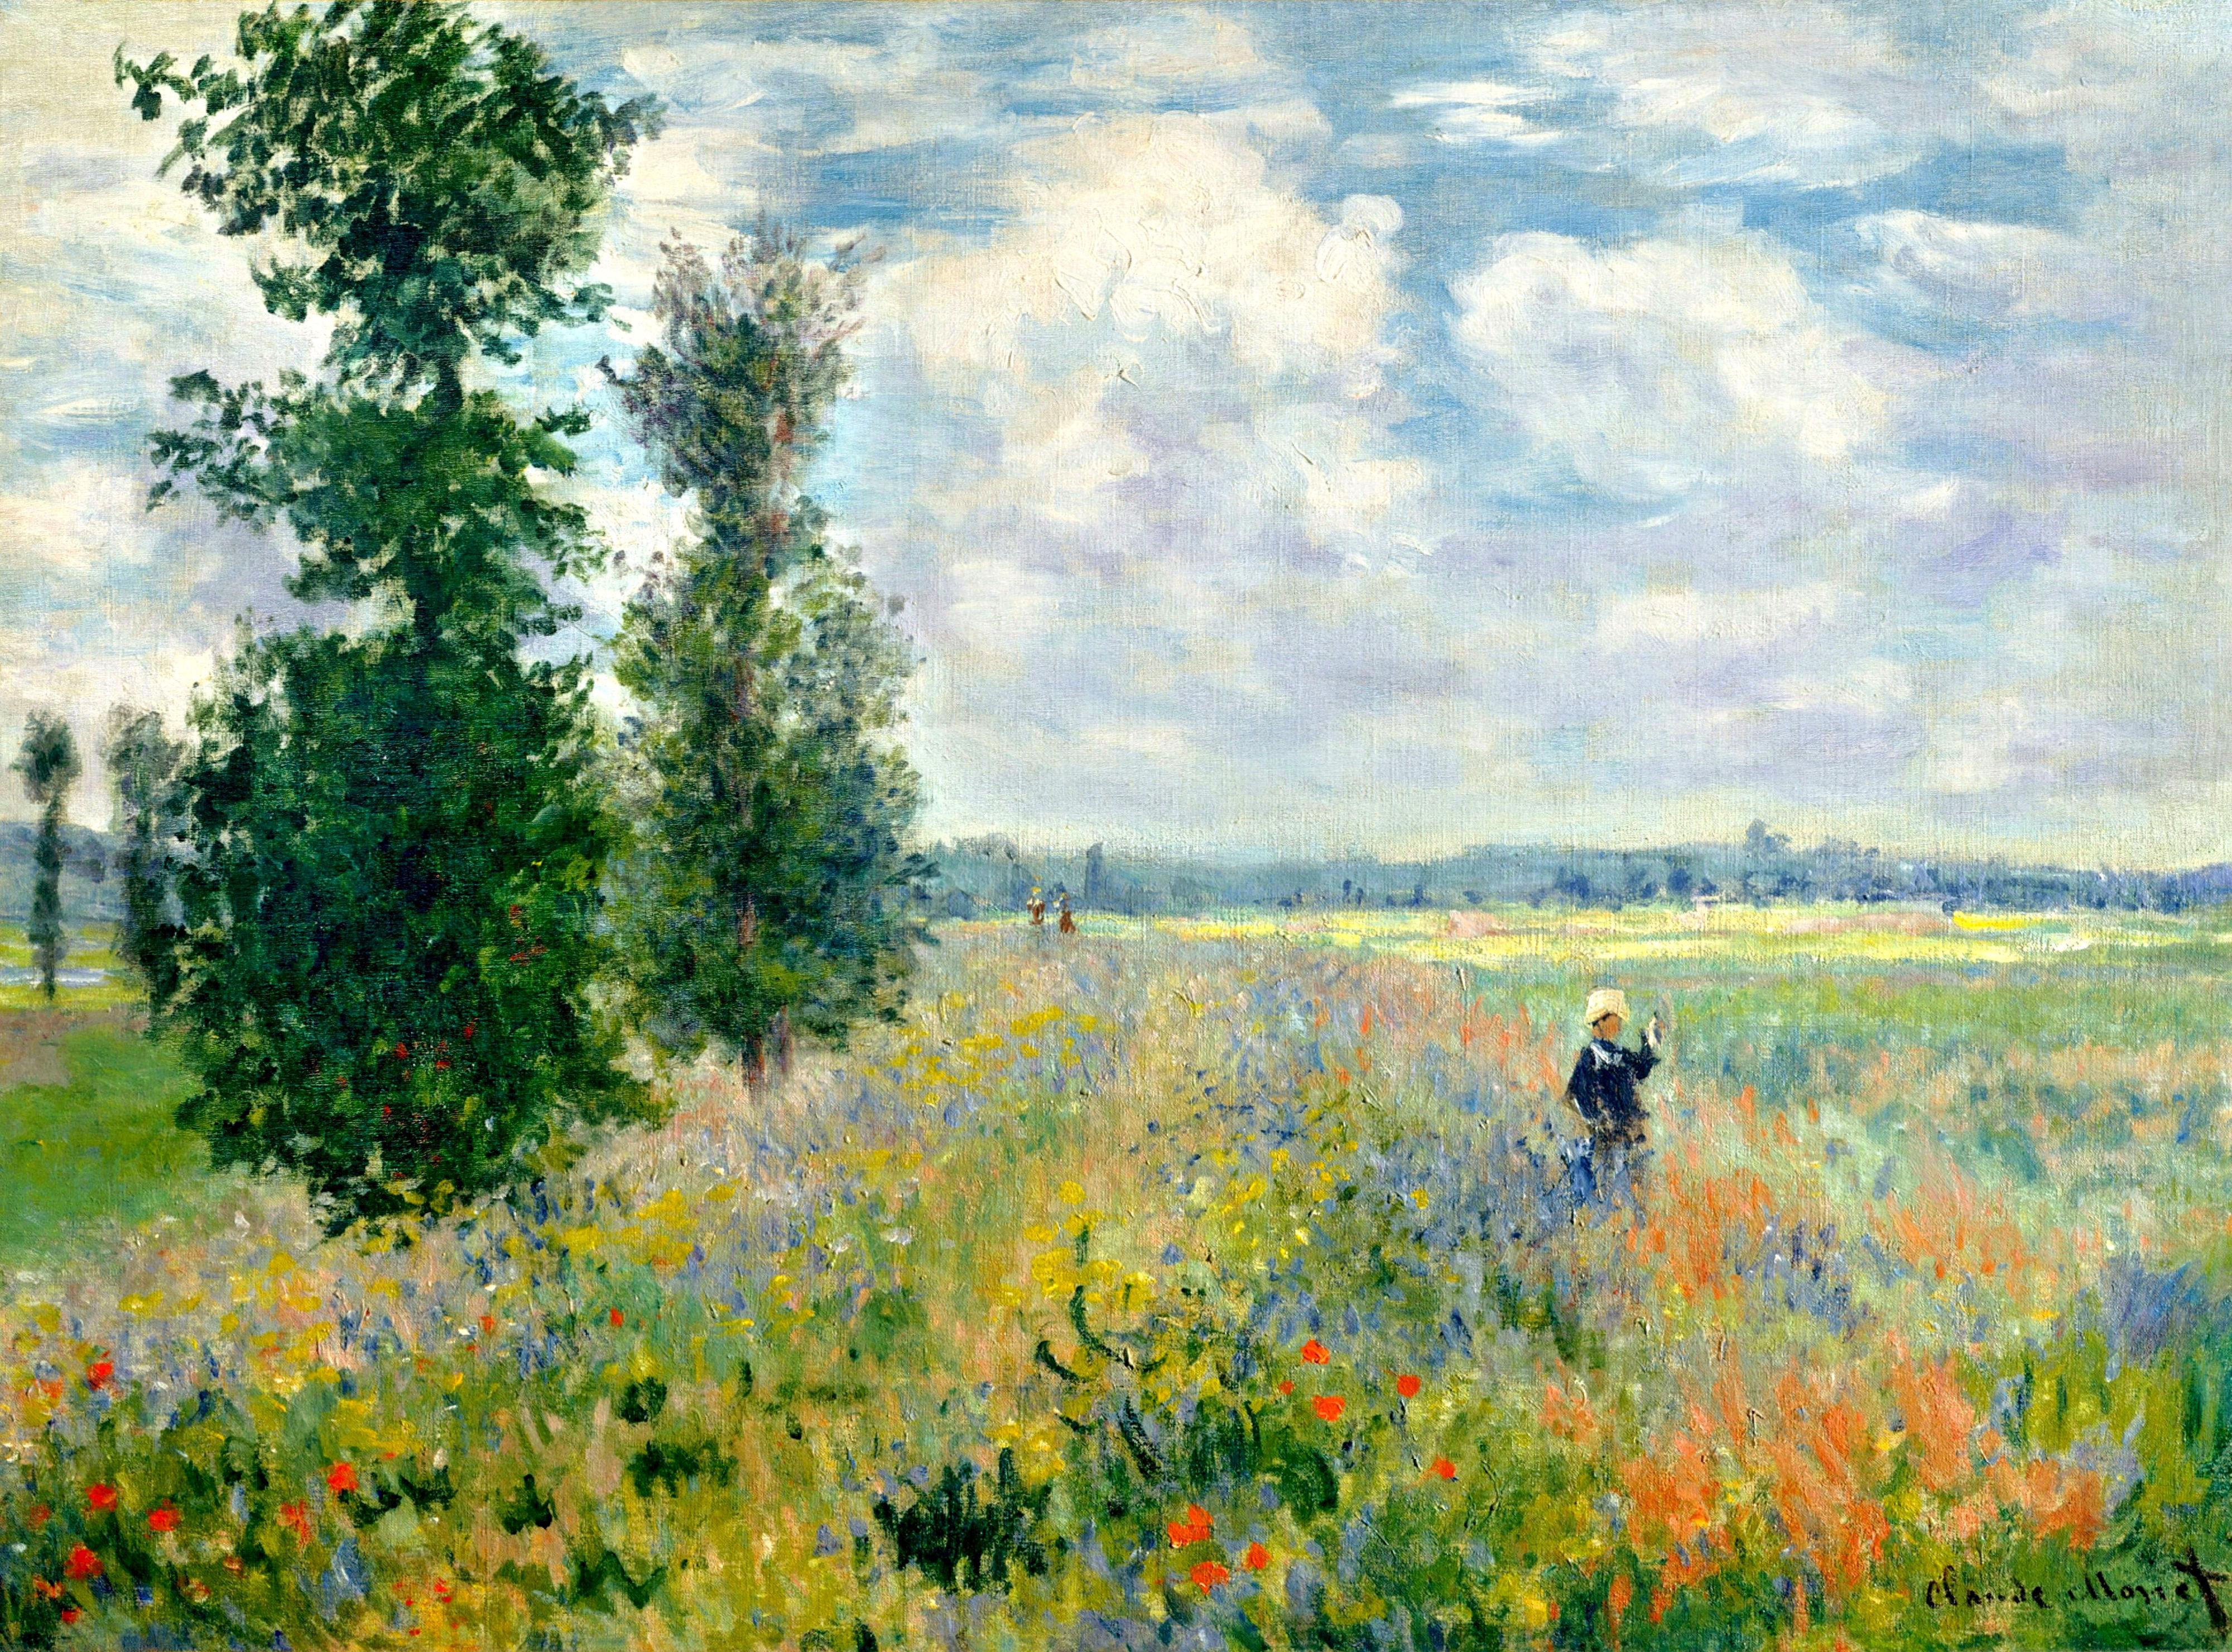 Claude Monet克劳德·莫奈 - 水木白艺术坊 - 贵阳画室 高考美术培训